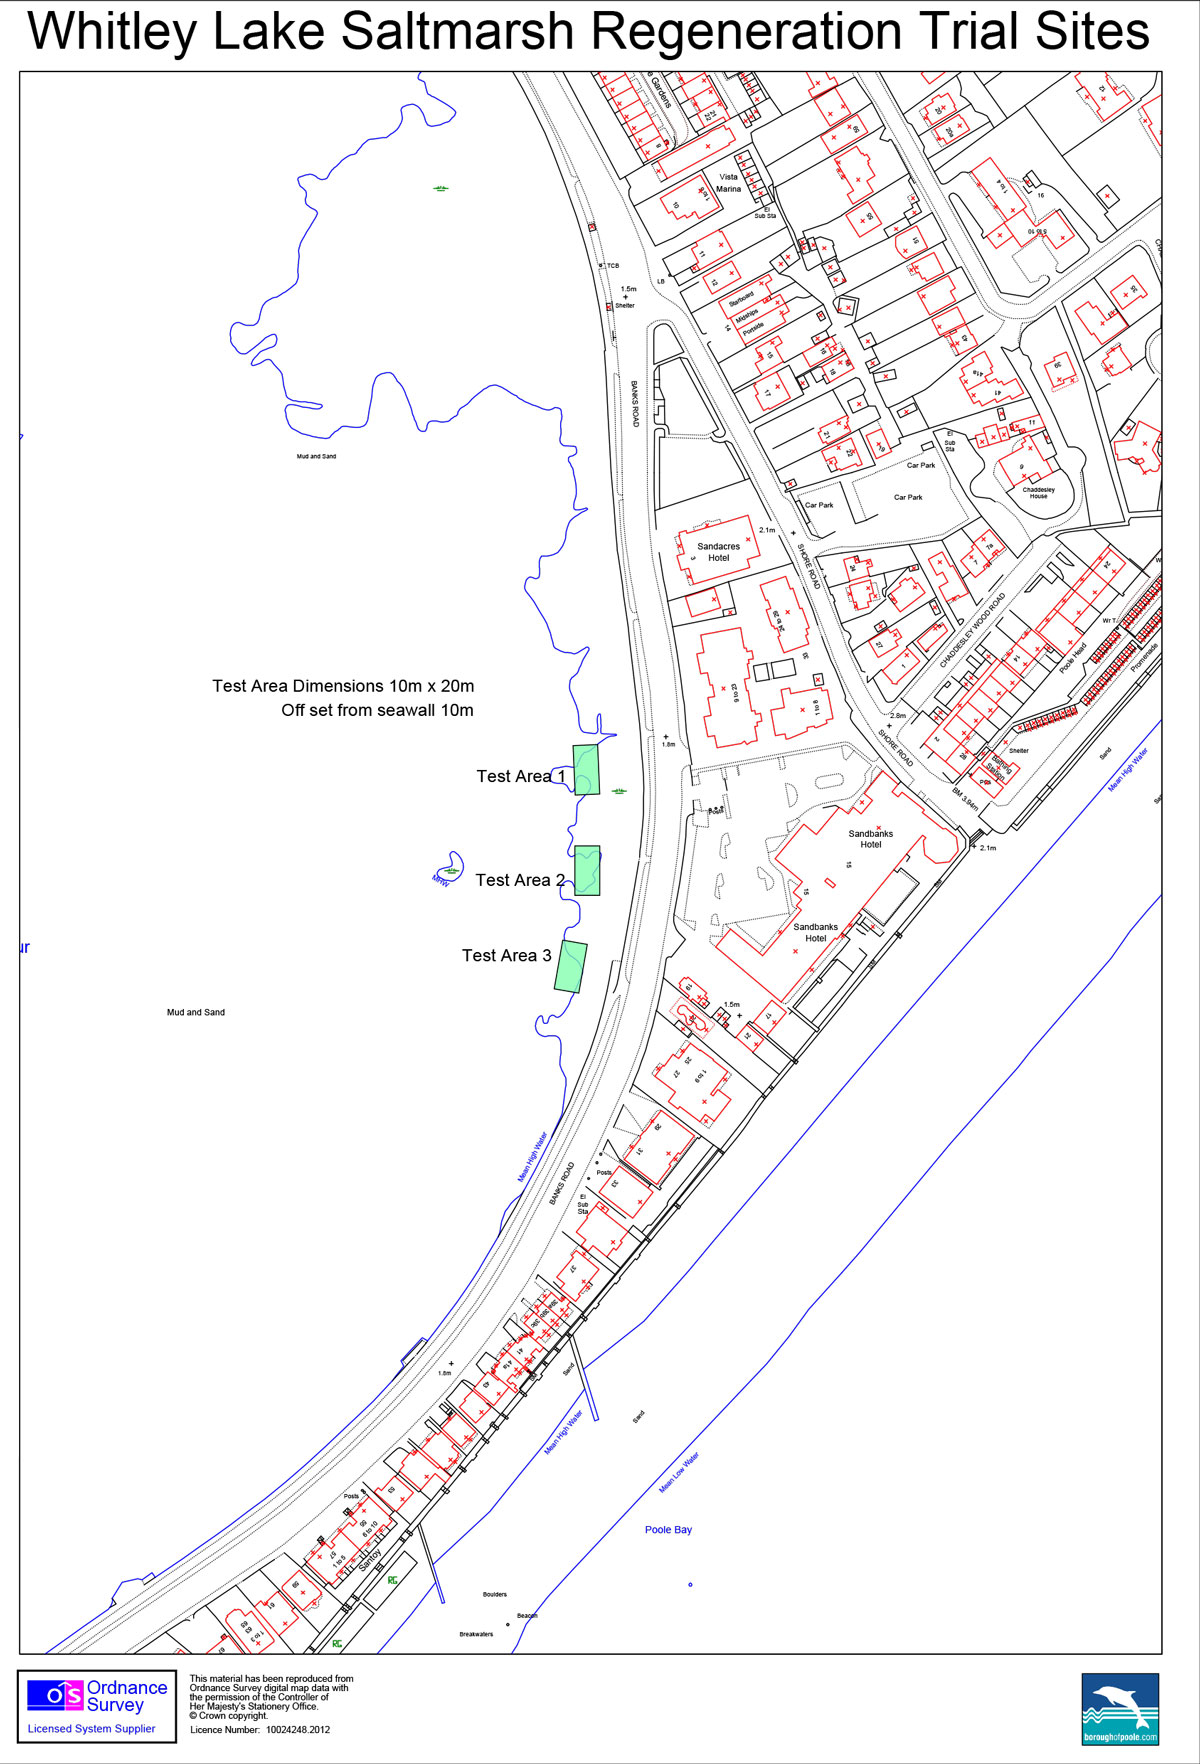 Saltmarsh Regeneration Trial Sites